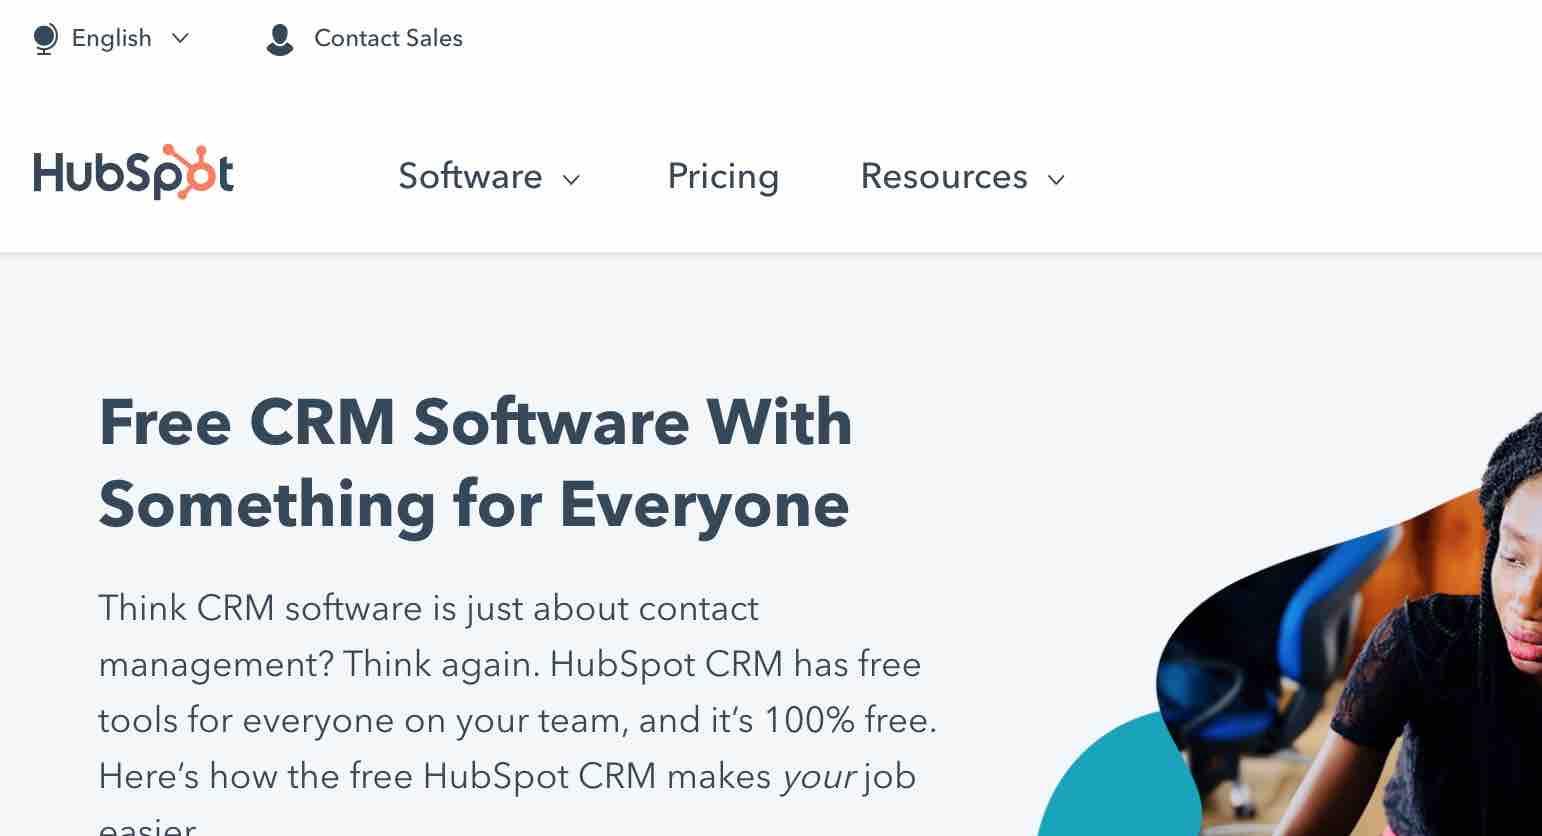 Free CRM Software Hubspot CRM